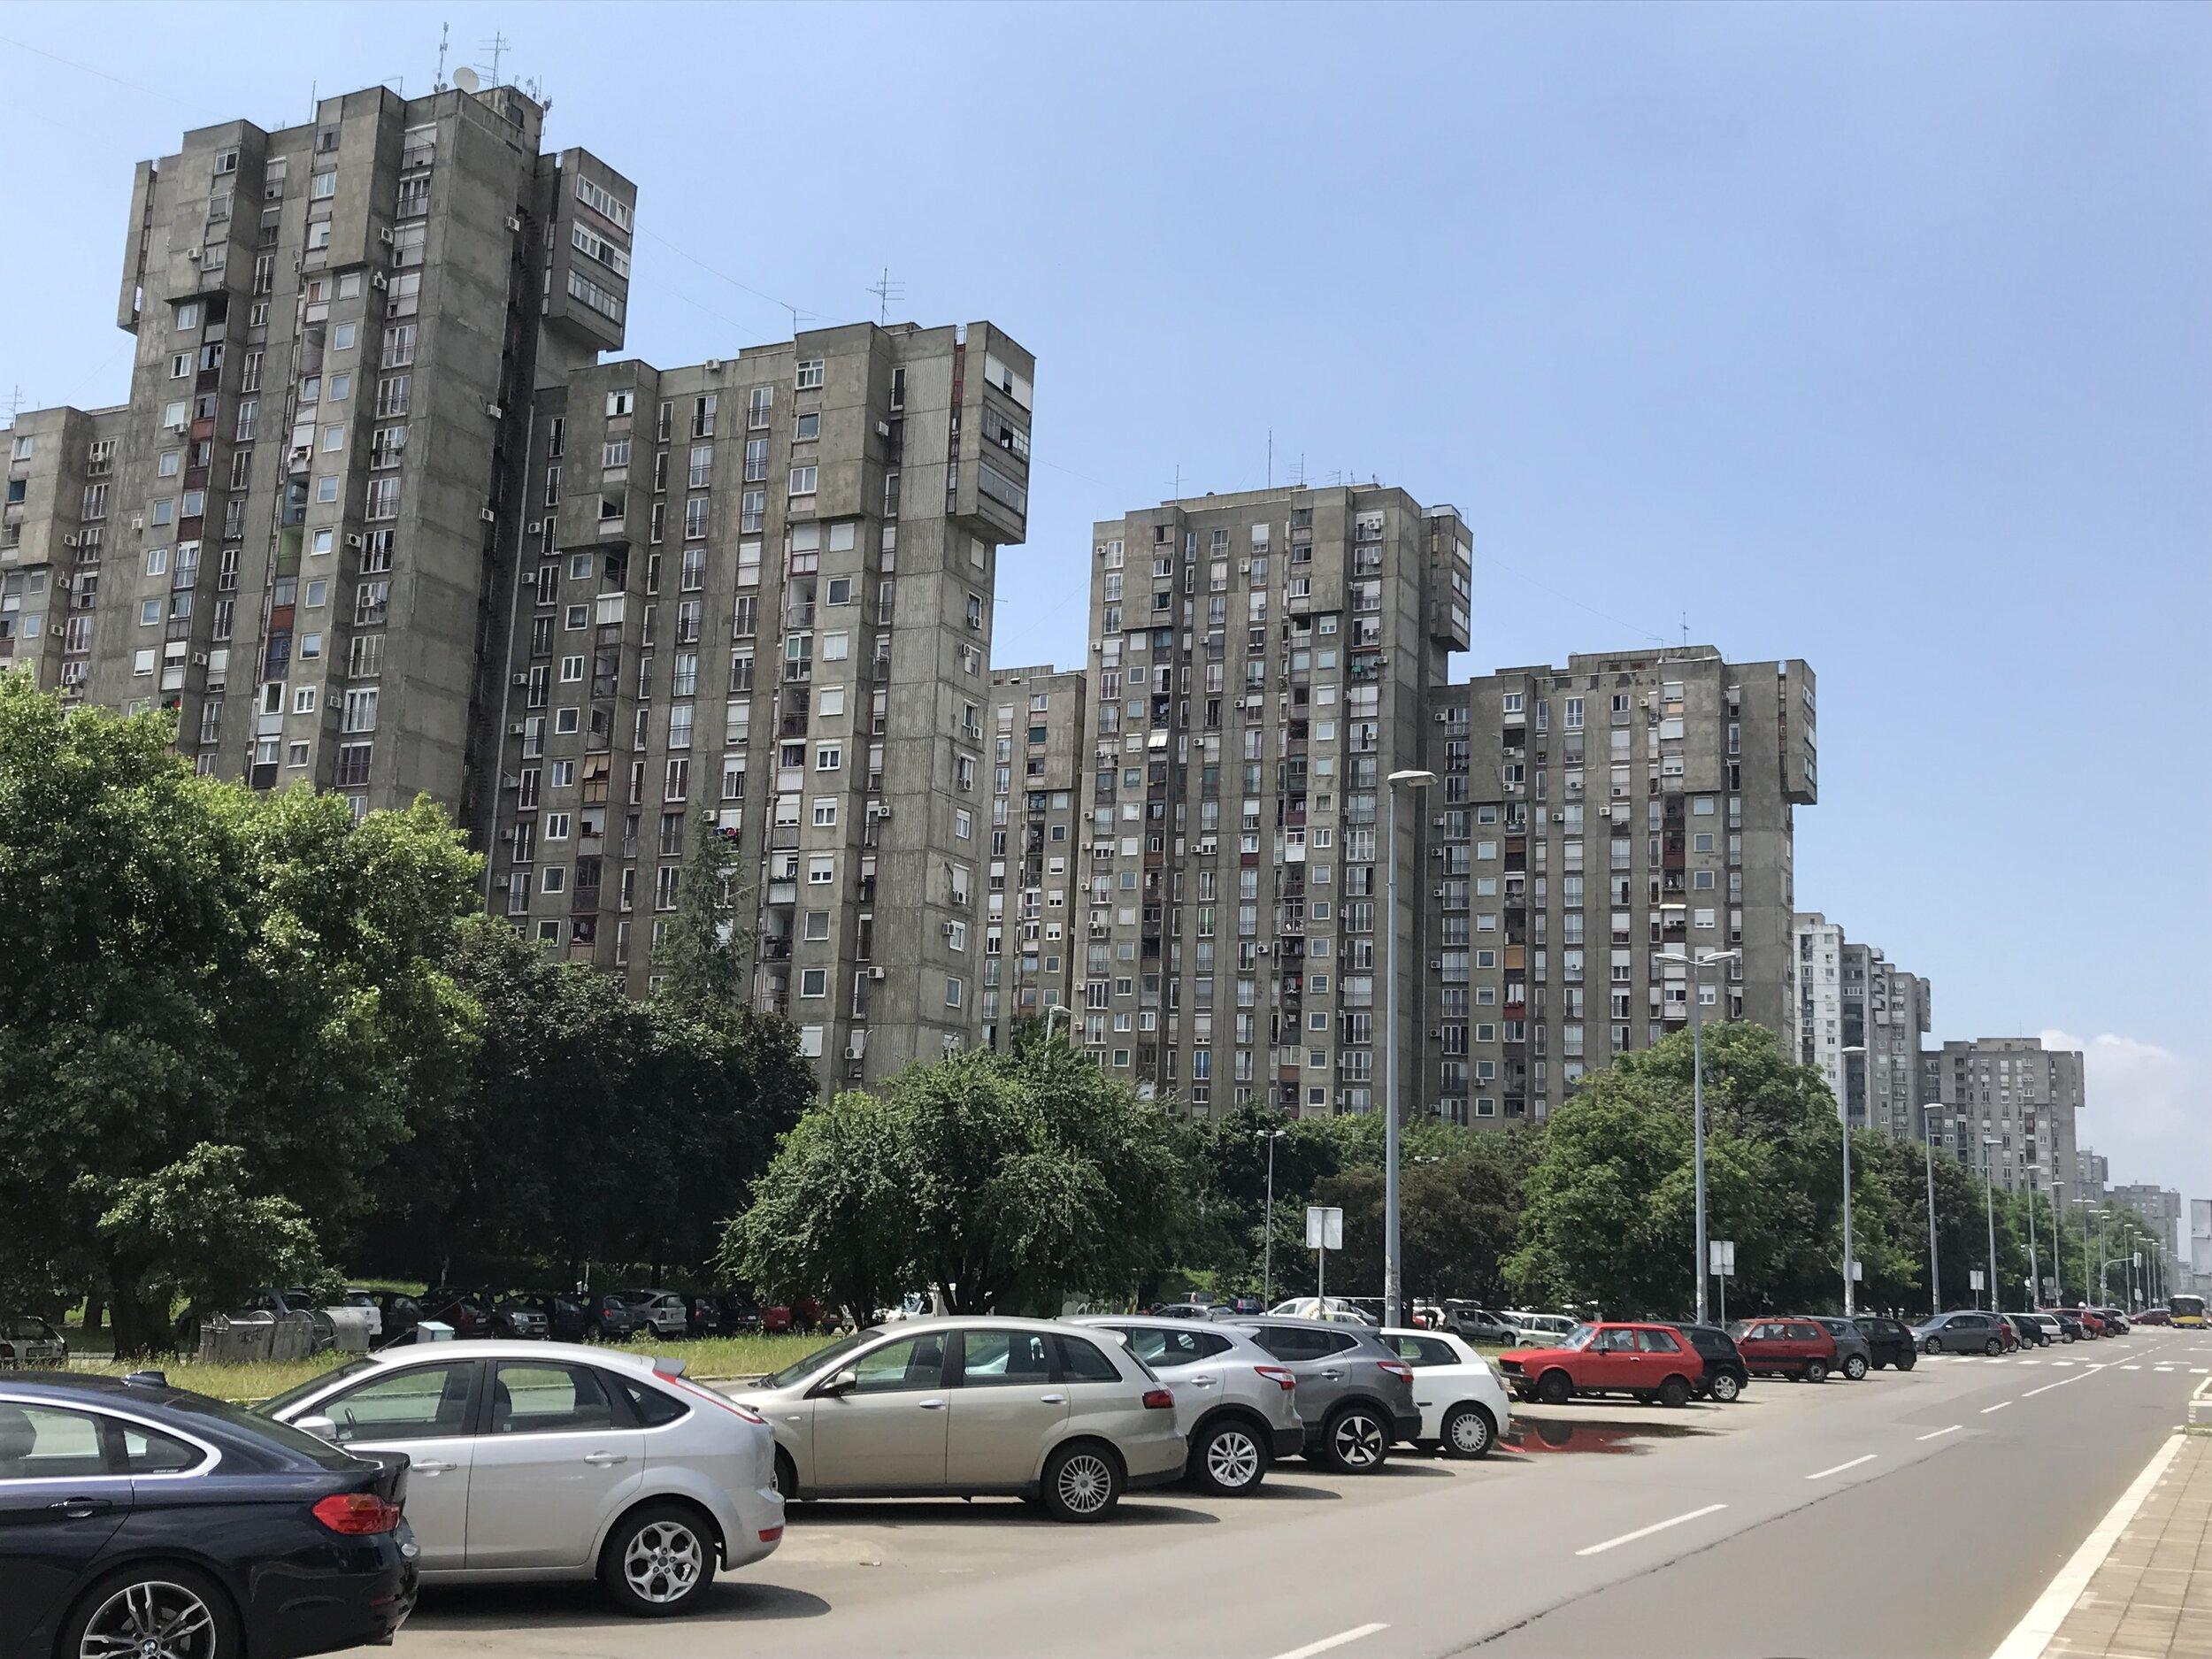 Figure 7. Bežanijski_02: Row of towers along Evrpska ulica, Bežanijski blokovi, 2019. Photograph by Michael R. Allen.